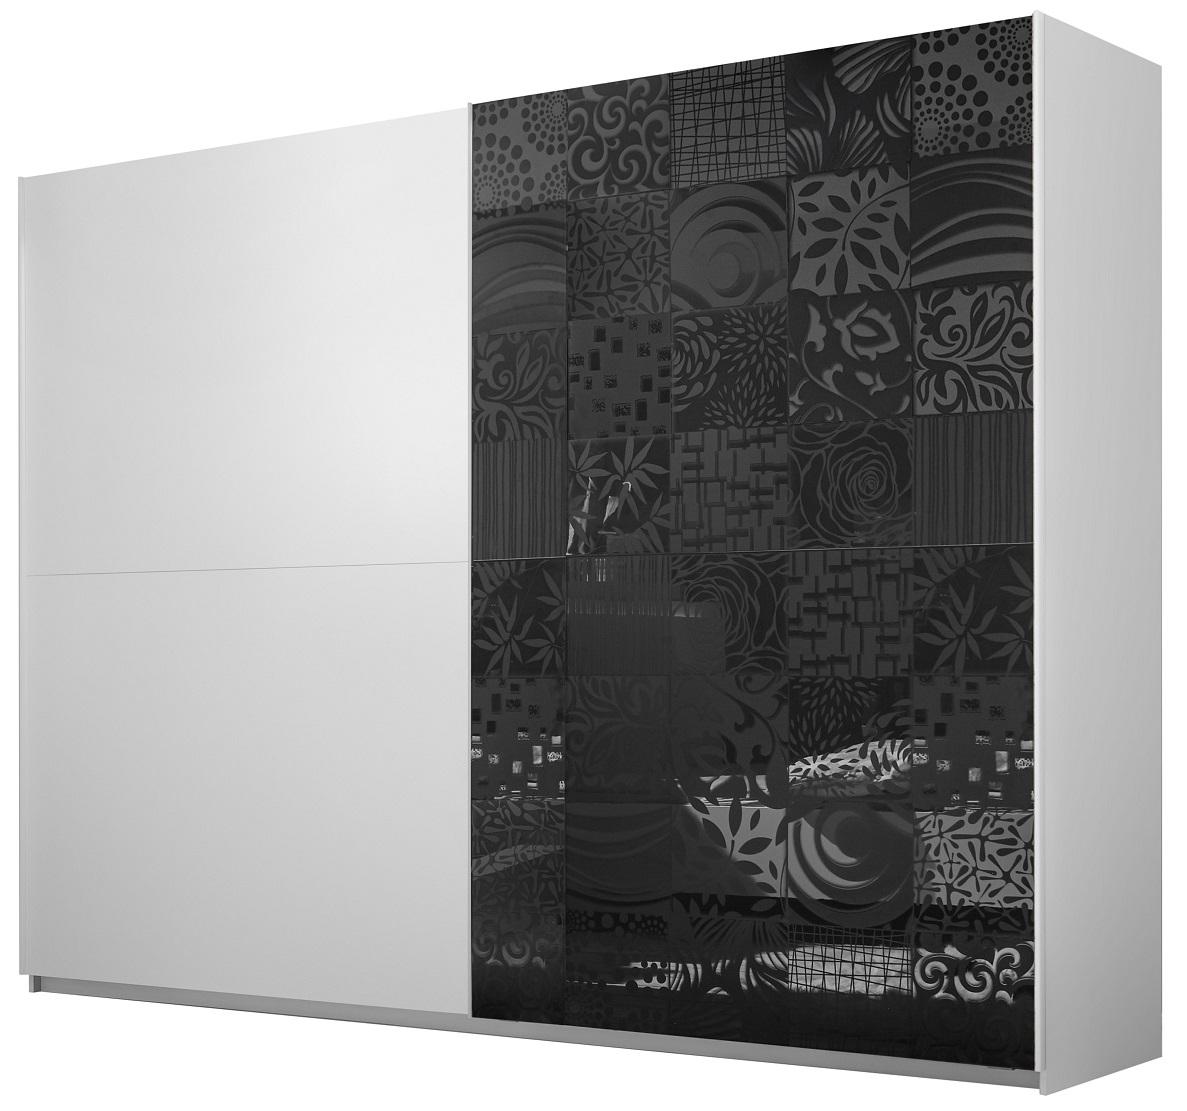 Kledingkast Perez 275 cm breed in mat wit met hoogglans antraciet | Pesaro Mobilia